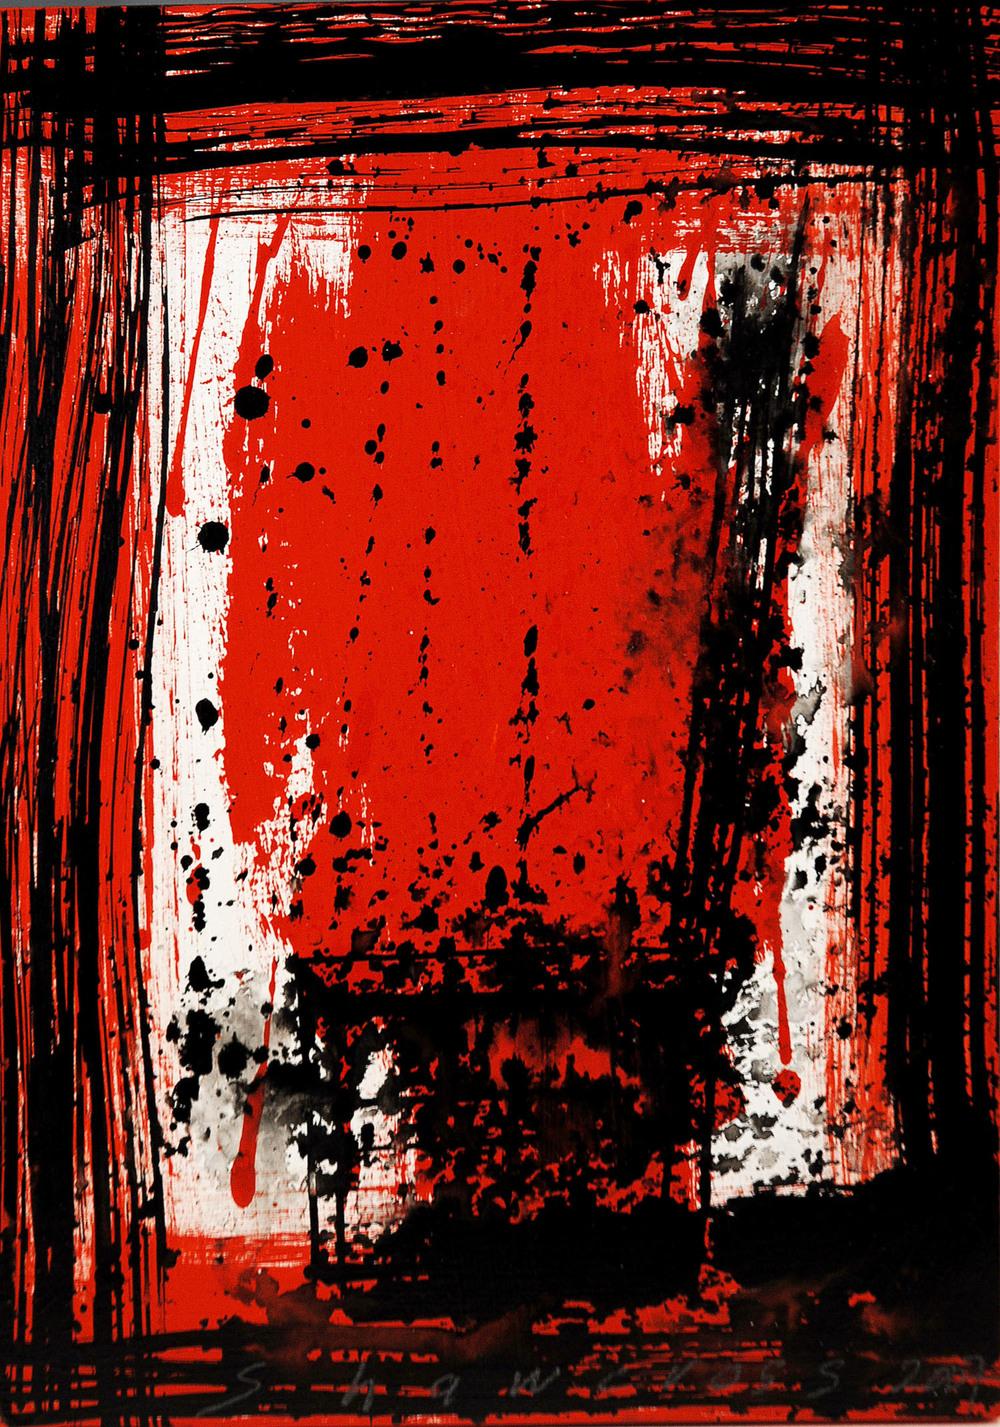 Neil Shawcross_2007_Chair # 9_acrylic on board_26 x 19cm.jpg